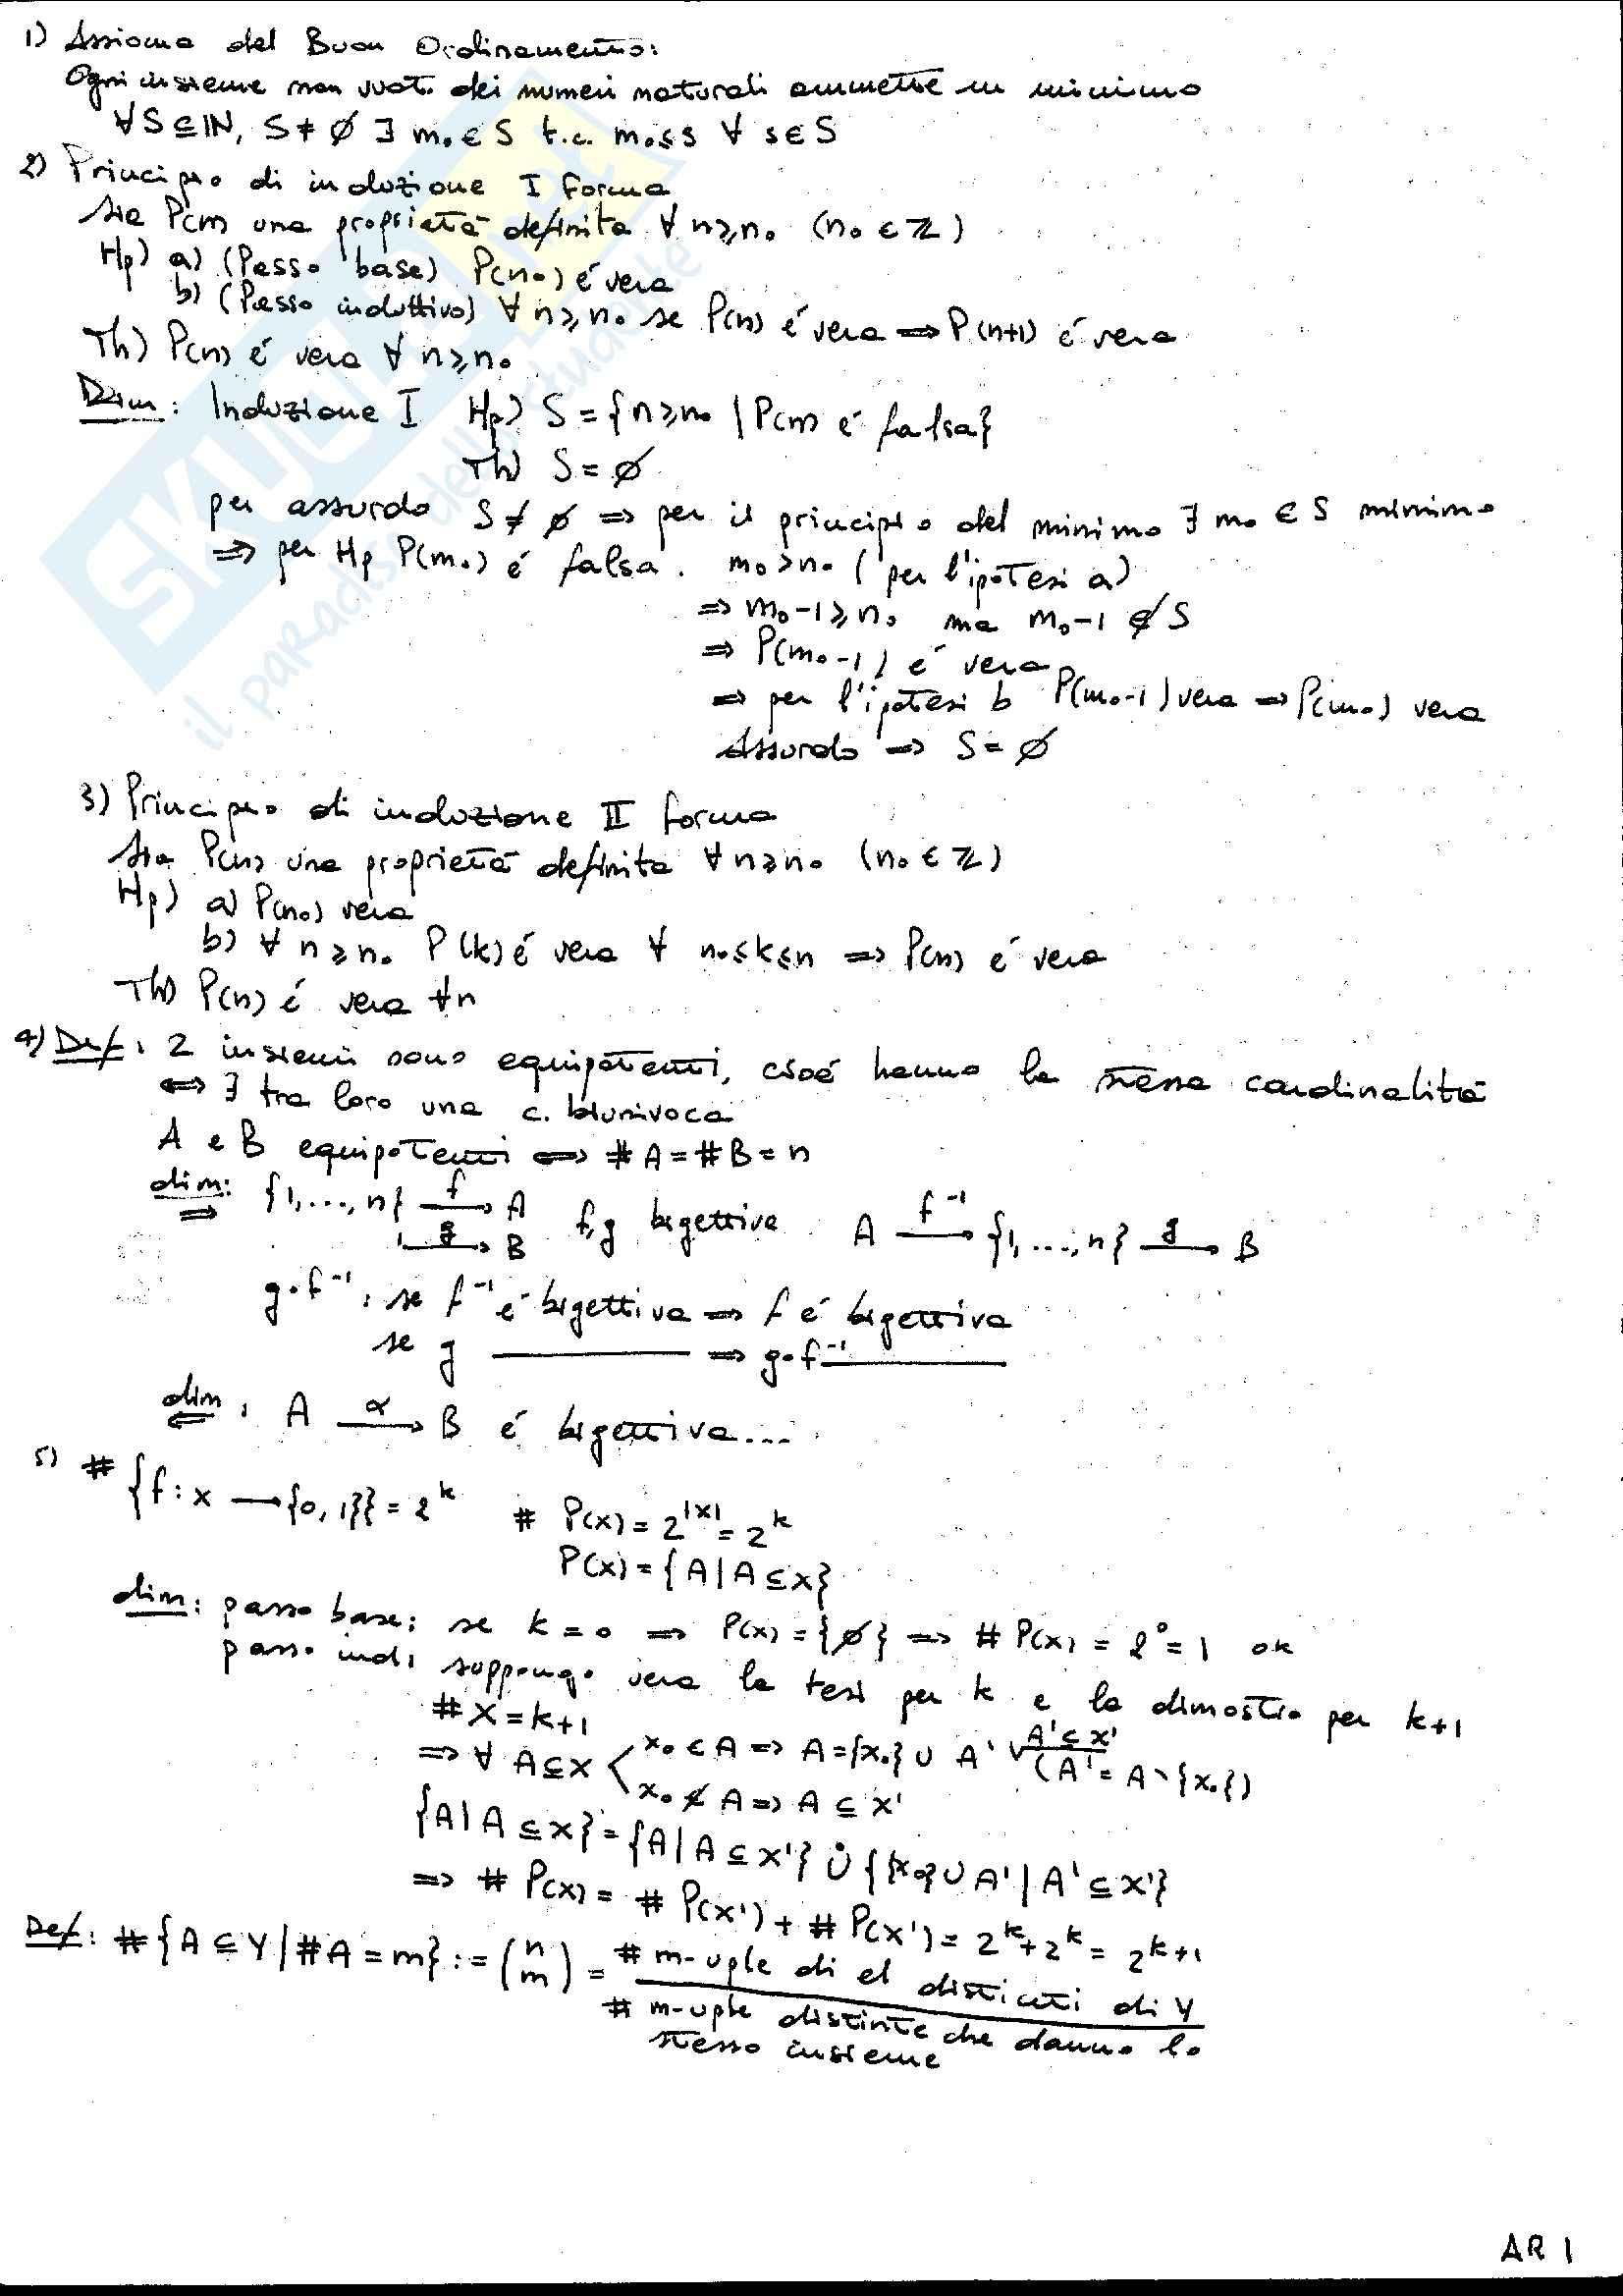 Principali teoremi Aritmetica, Algebra